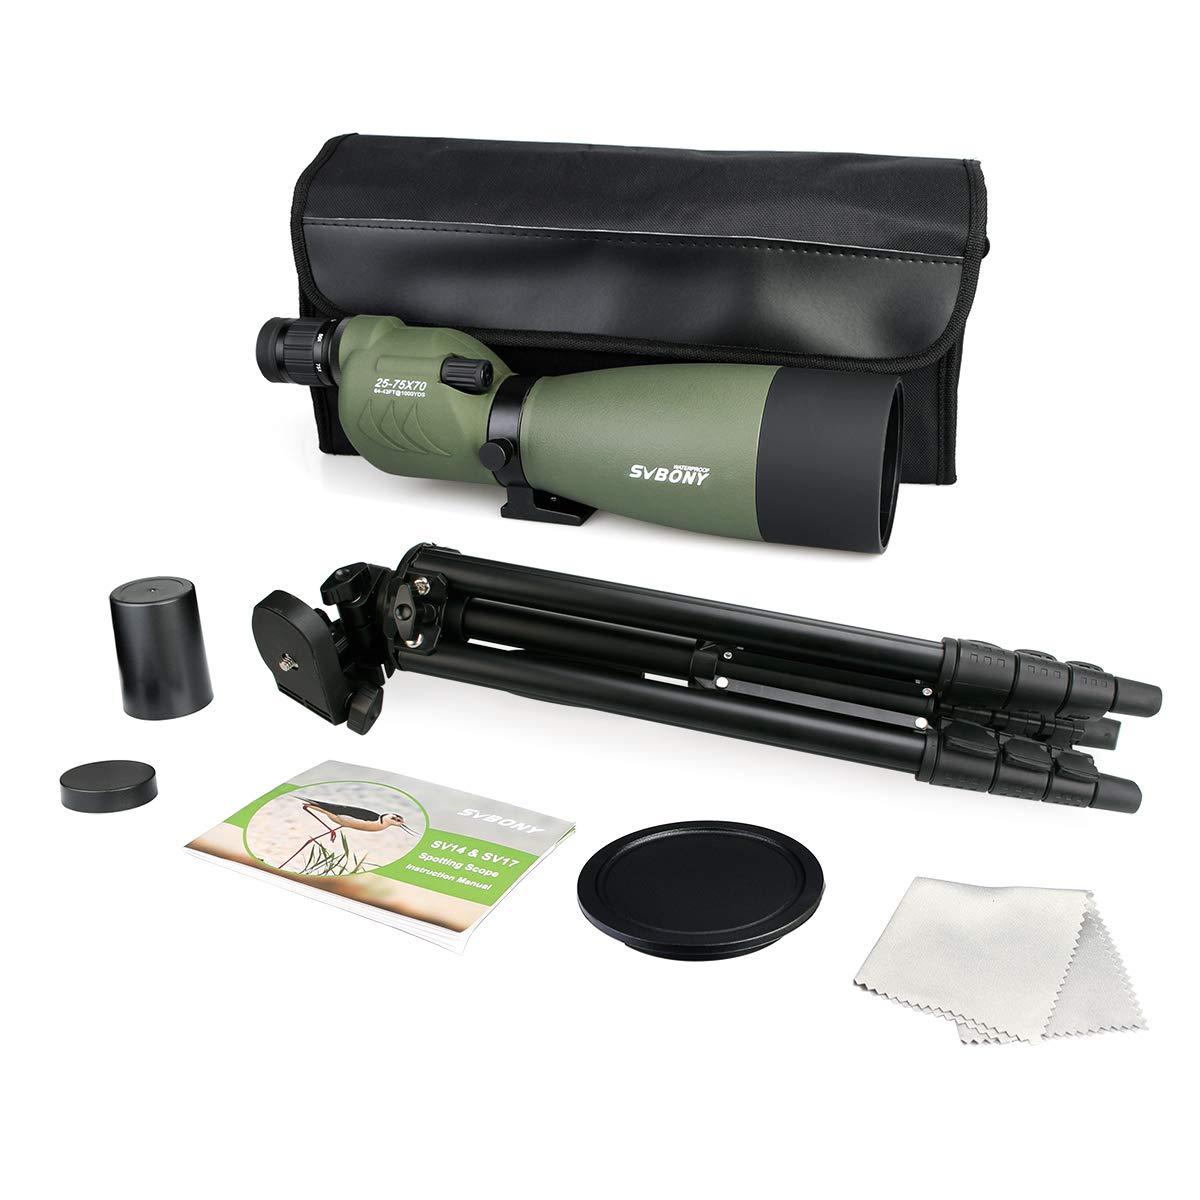 SVBONY SV17 Spotting Scope for Target Shooting Straight scope pic-1